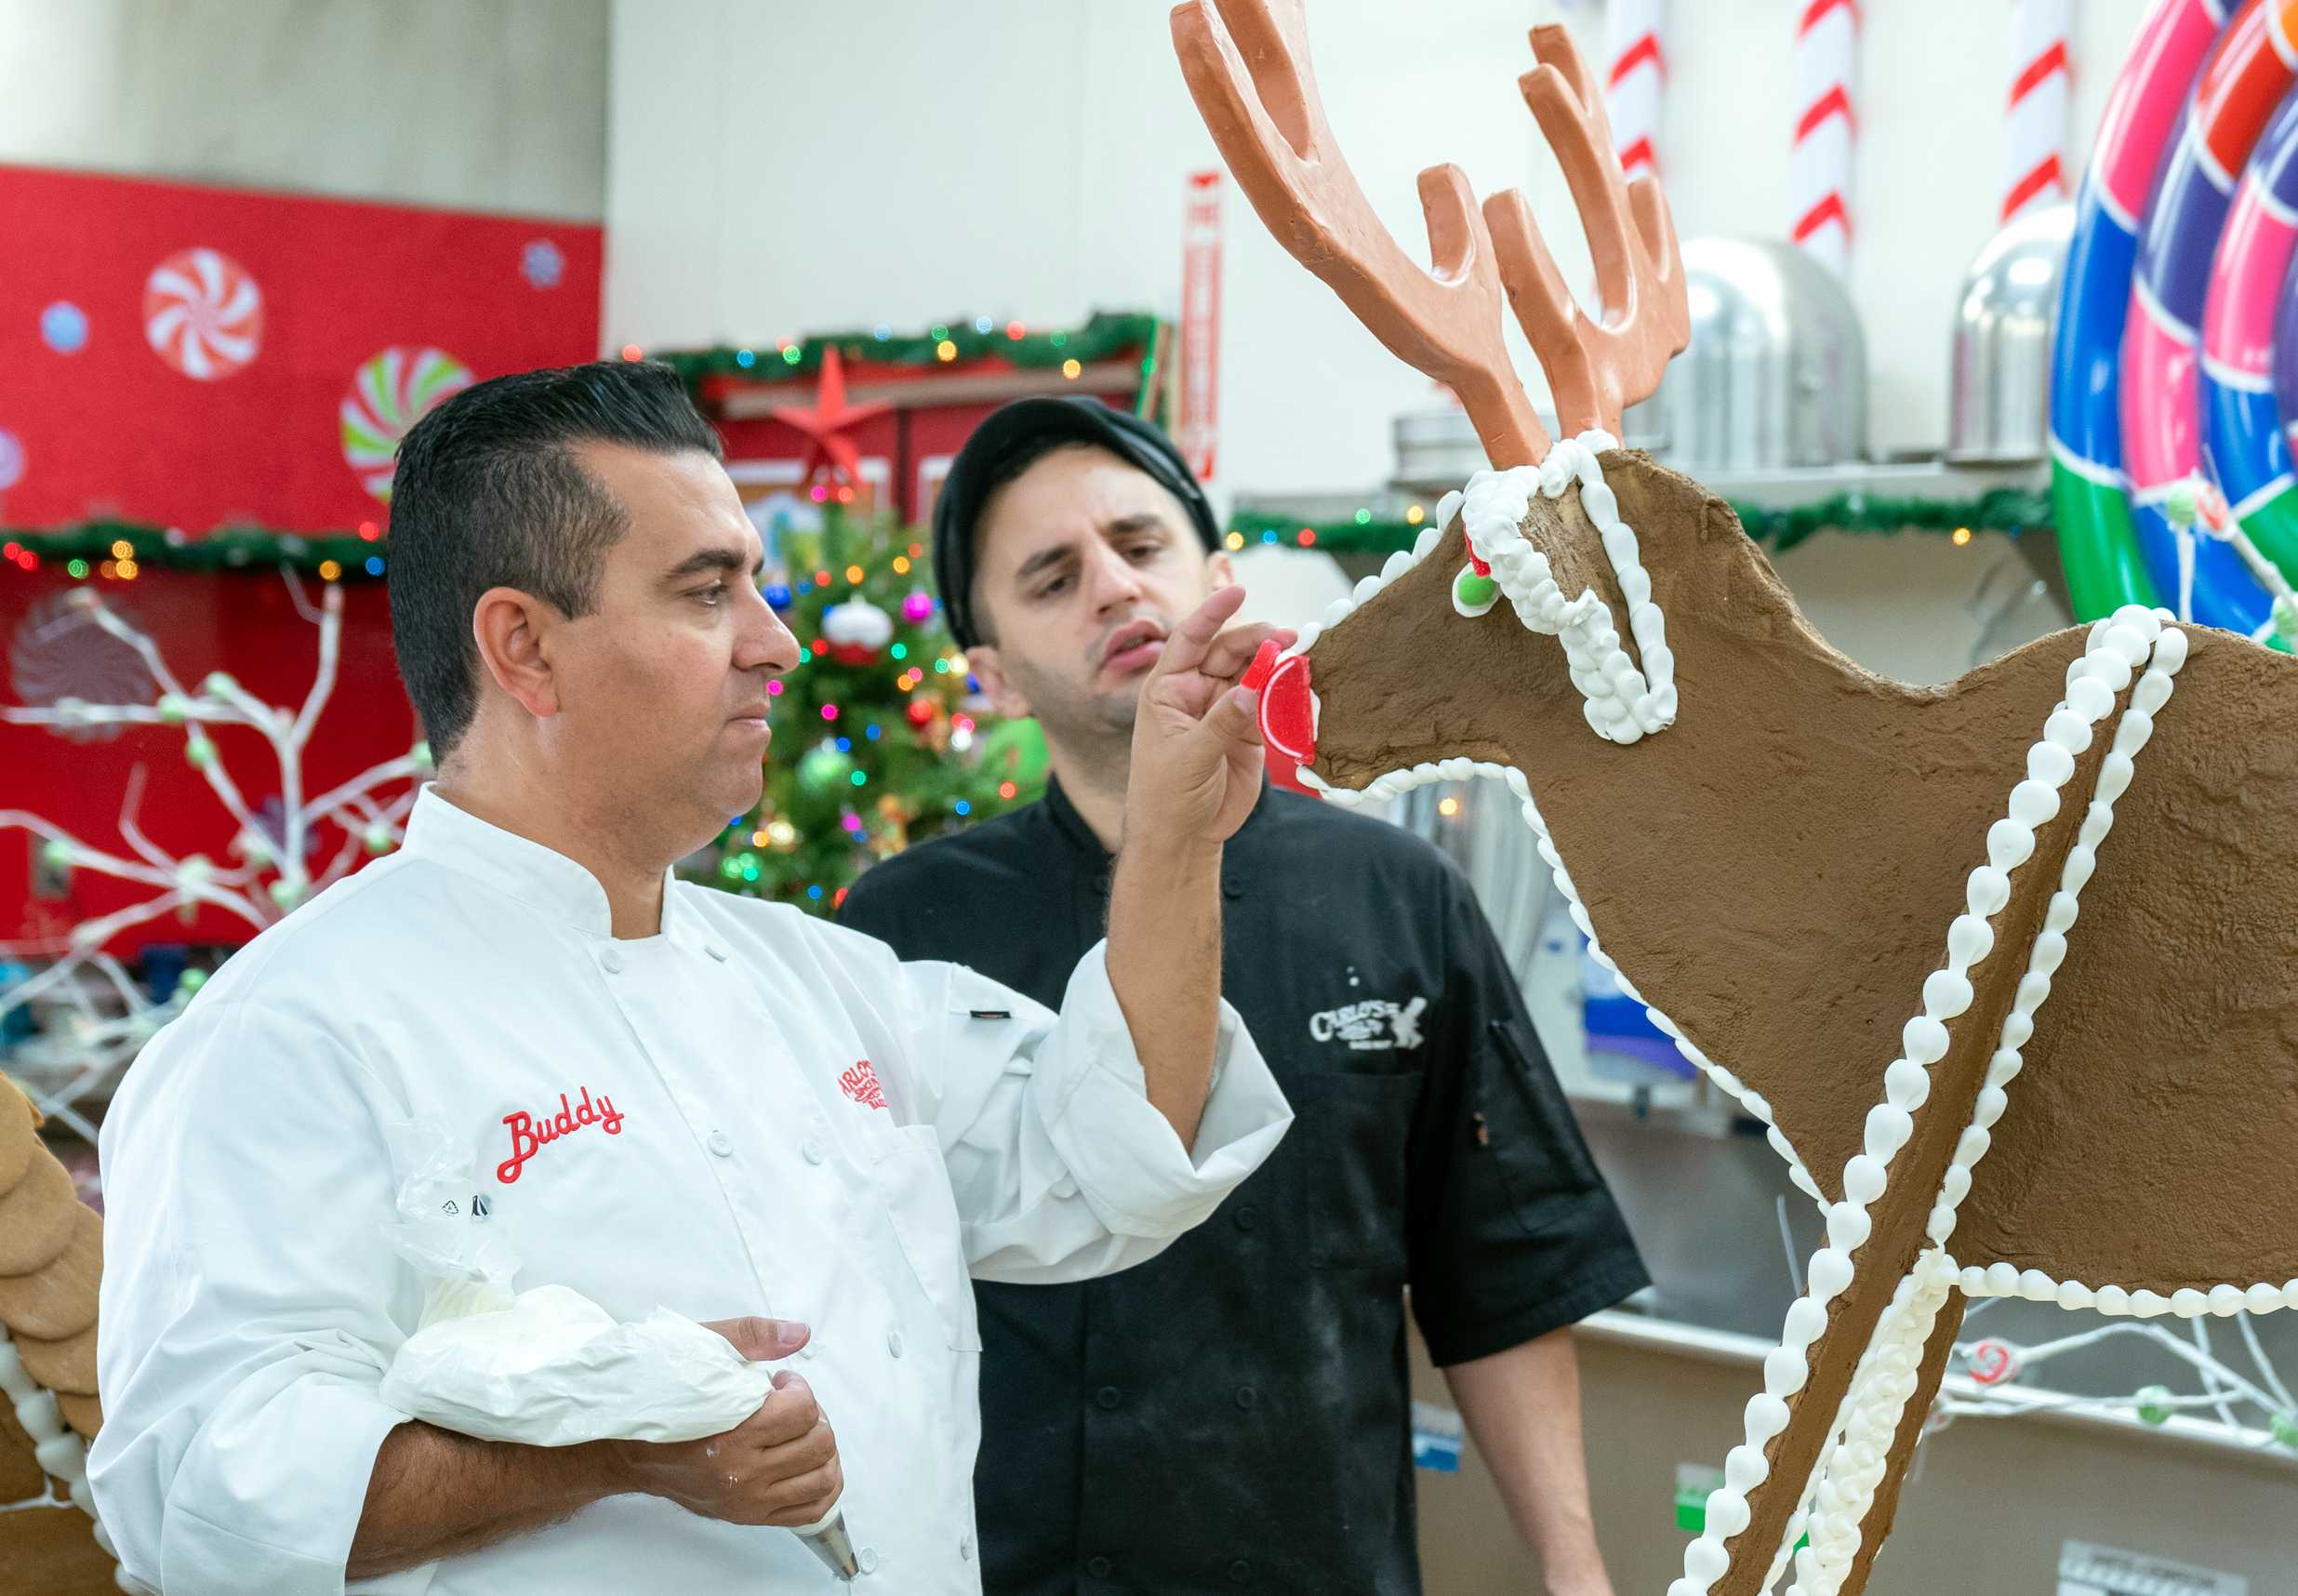 Team-Buddy-Valastro-Ralph-Attanasia-Buddy vs Christmas-Food-Network